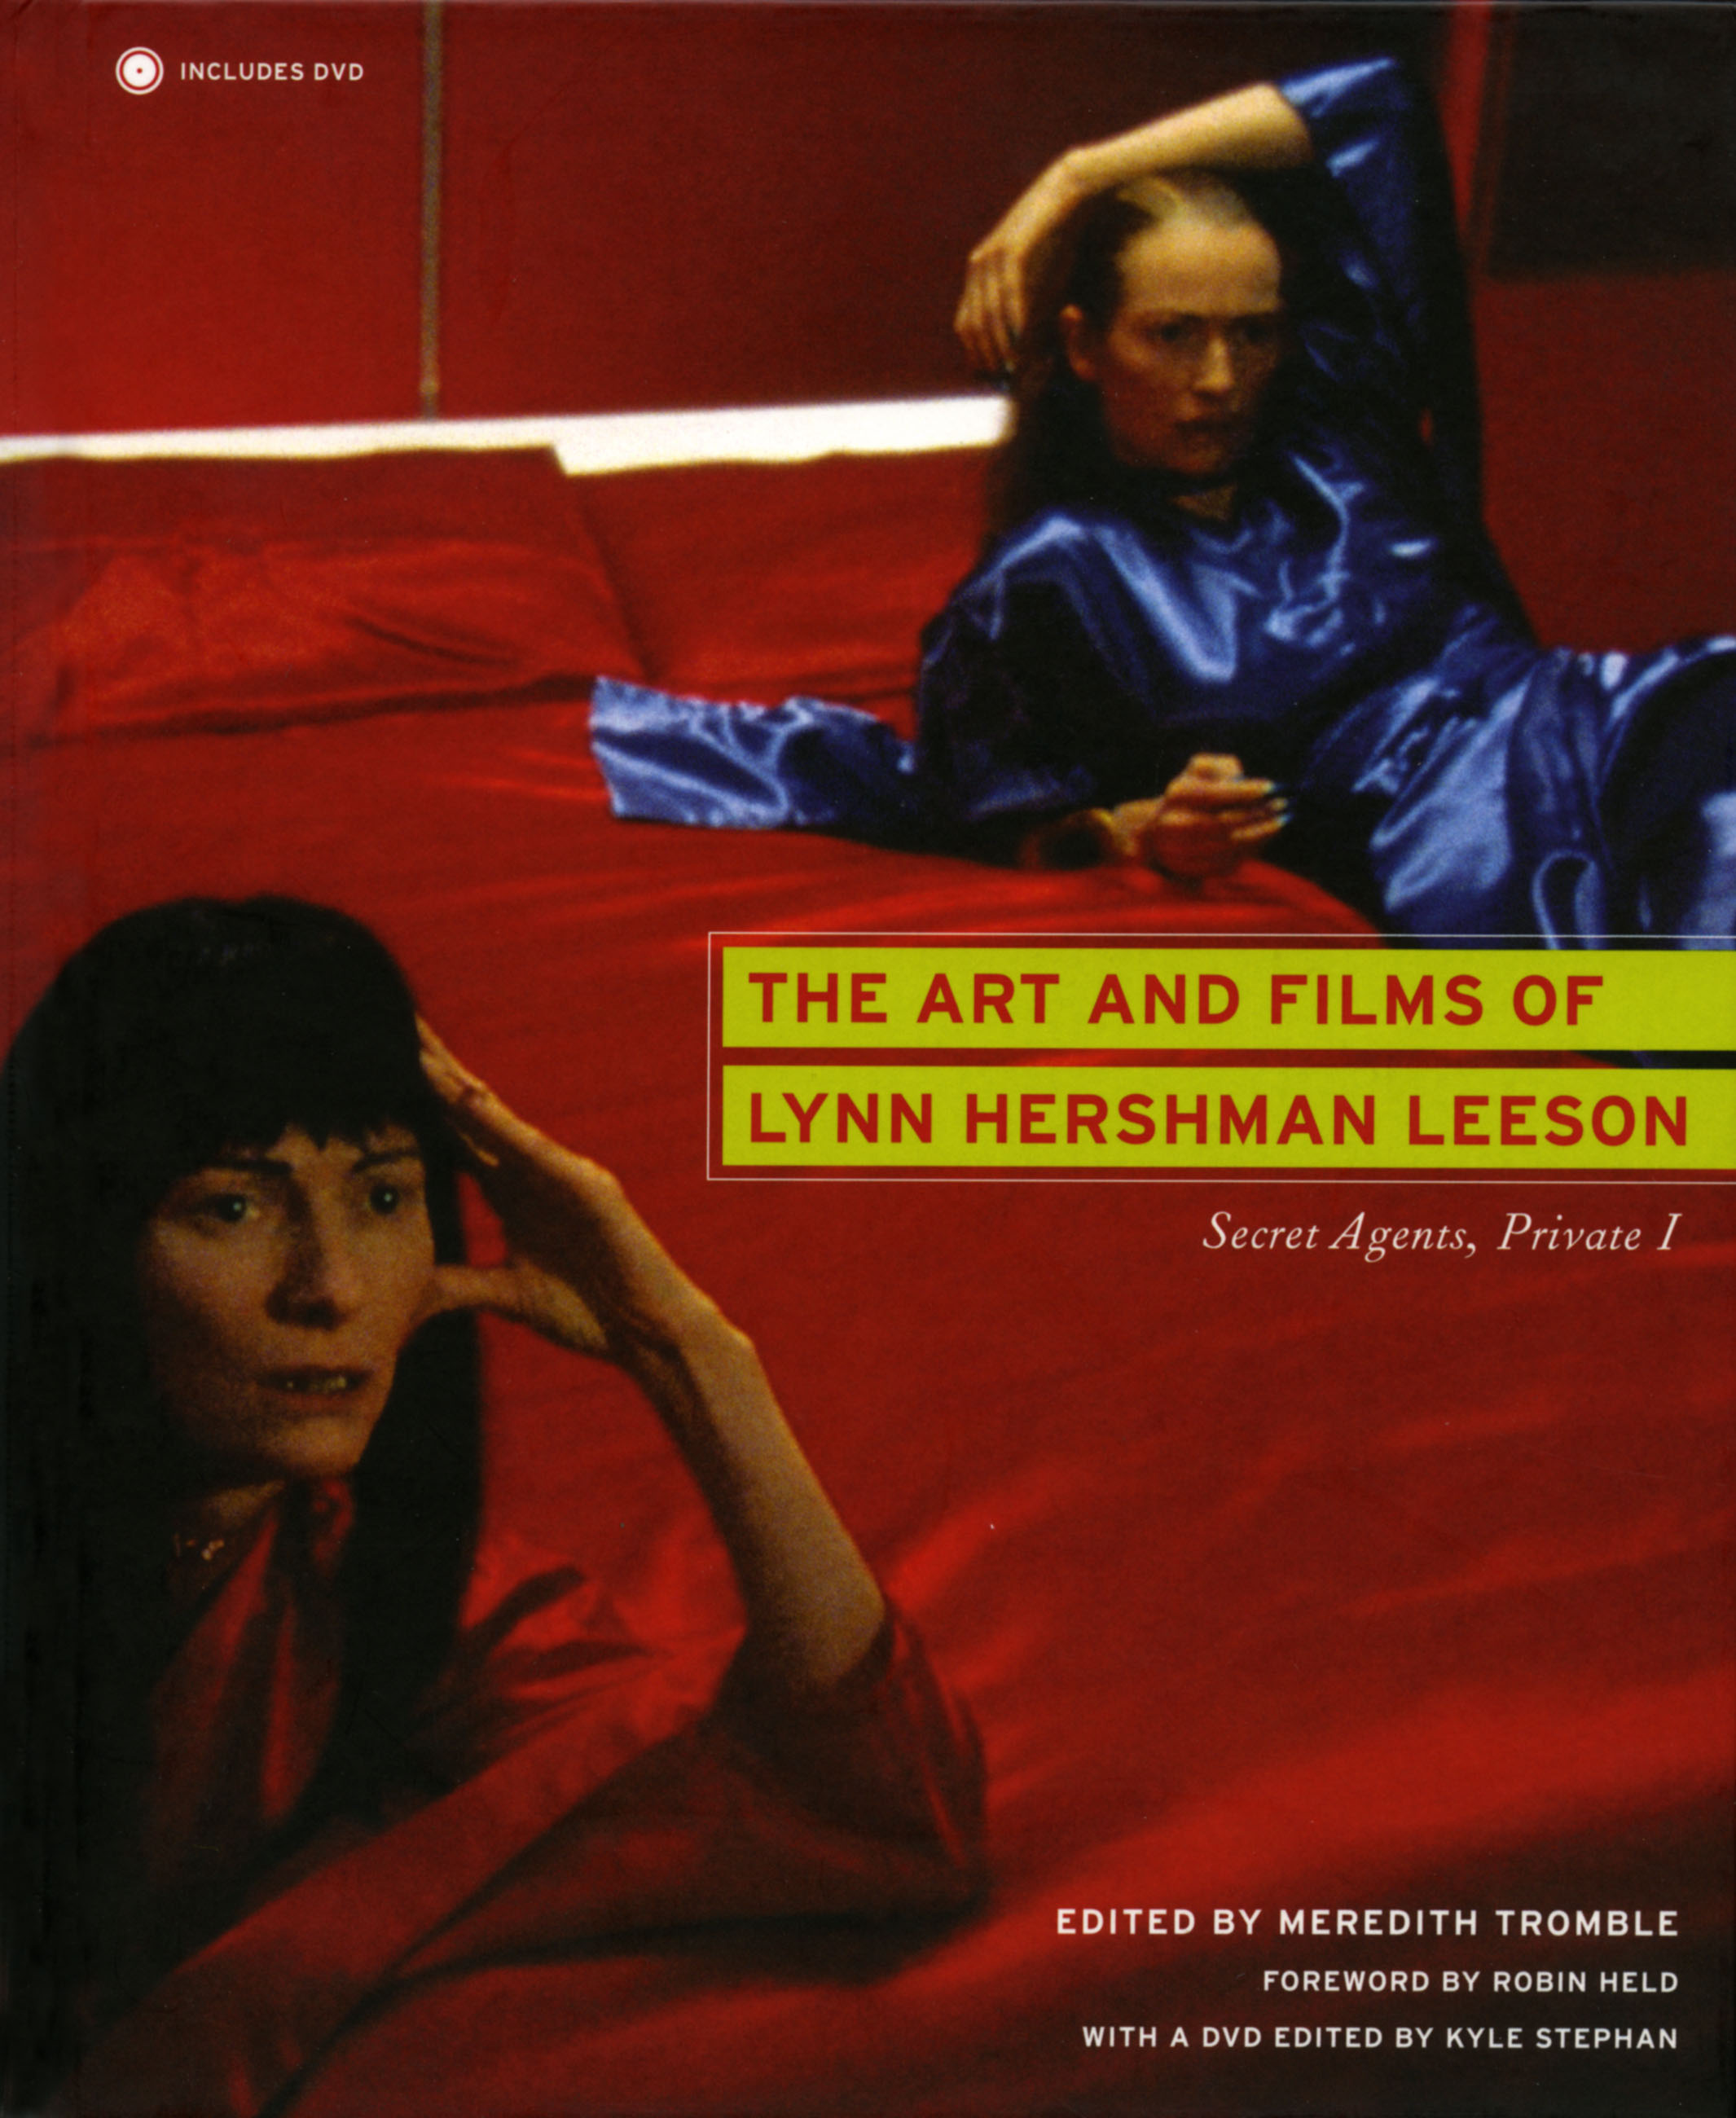 art-and-films-of-lynn-hershman-leeson.jpg